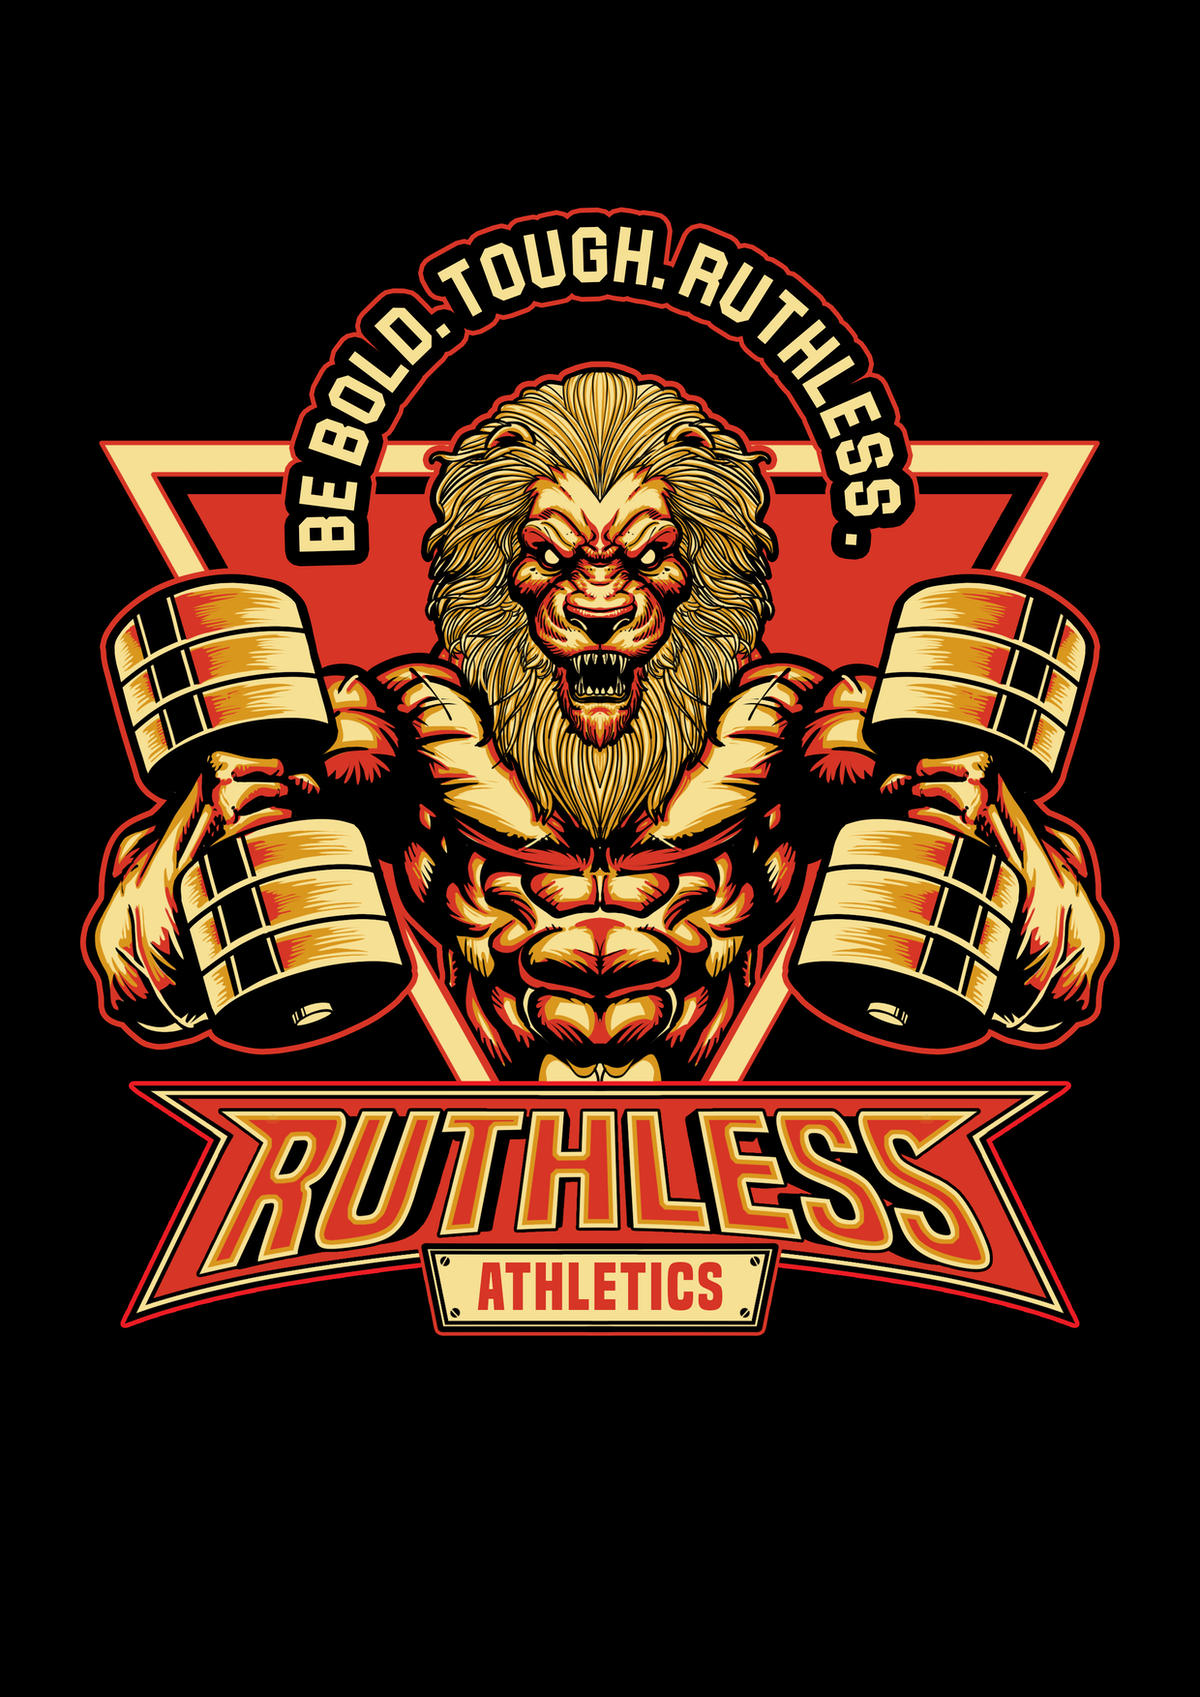 Ruthless Athletics